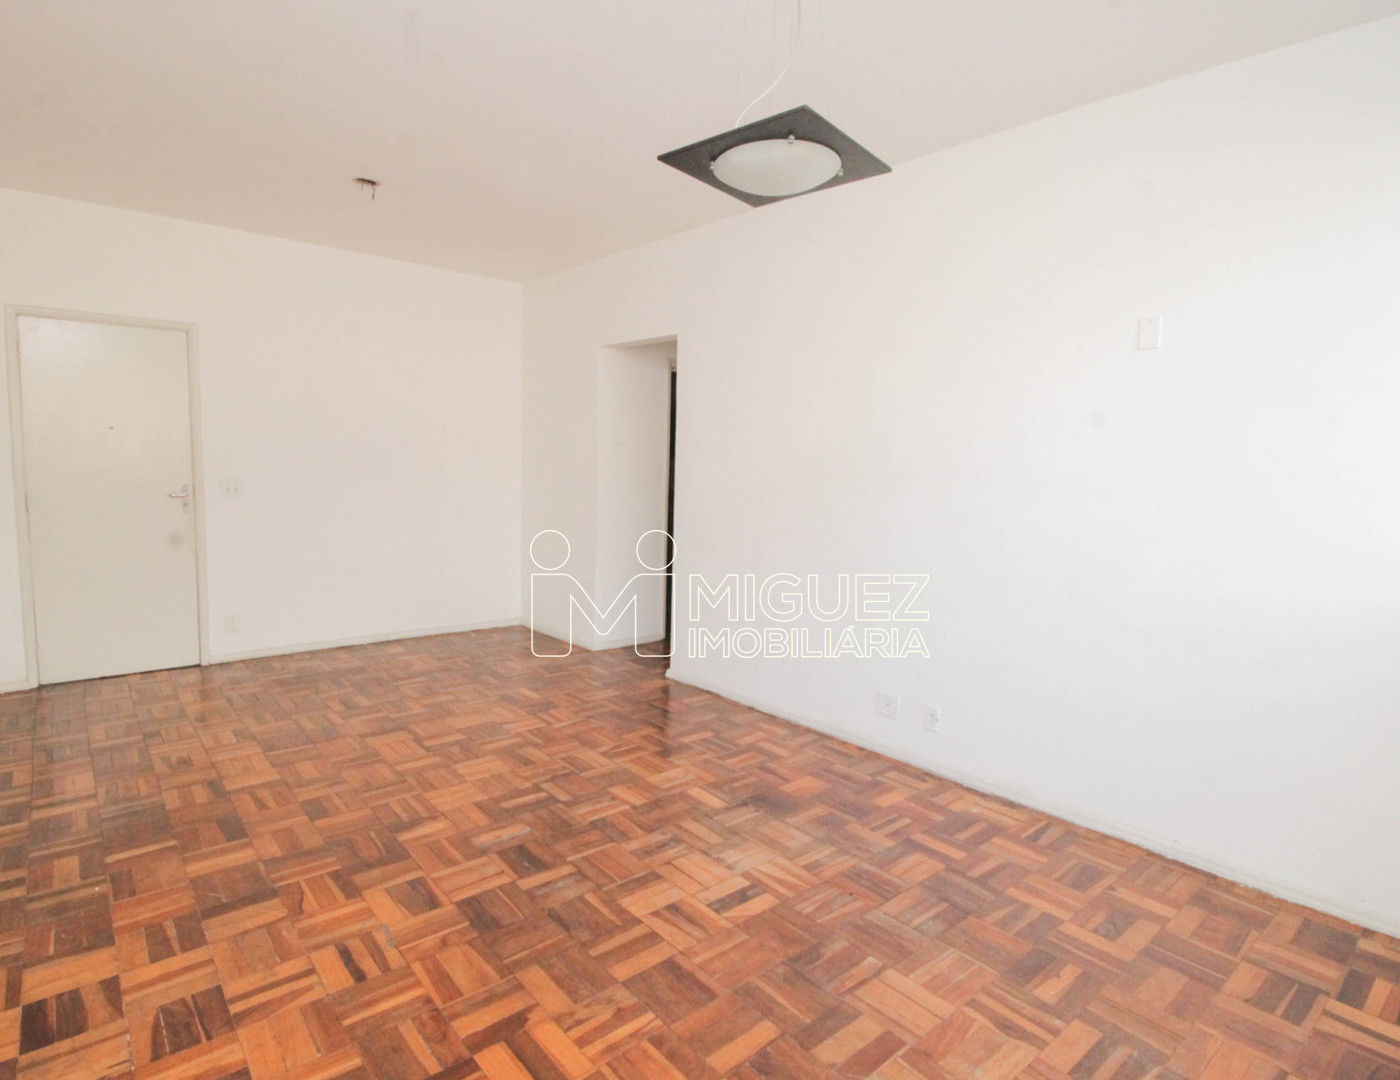 Apartamento, aluguel, Rua Visconde de Itamarati - Tijuca , Rio de janeiro